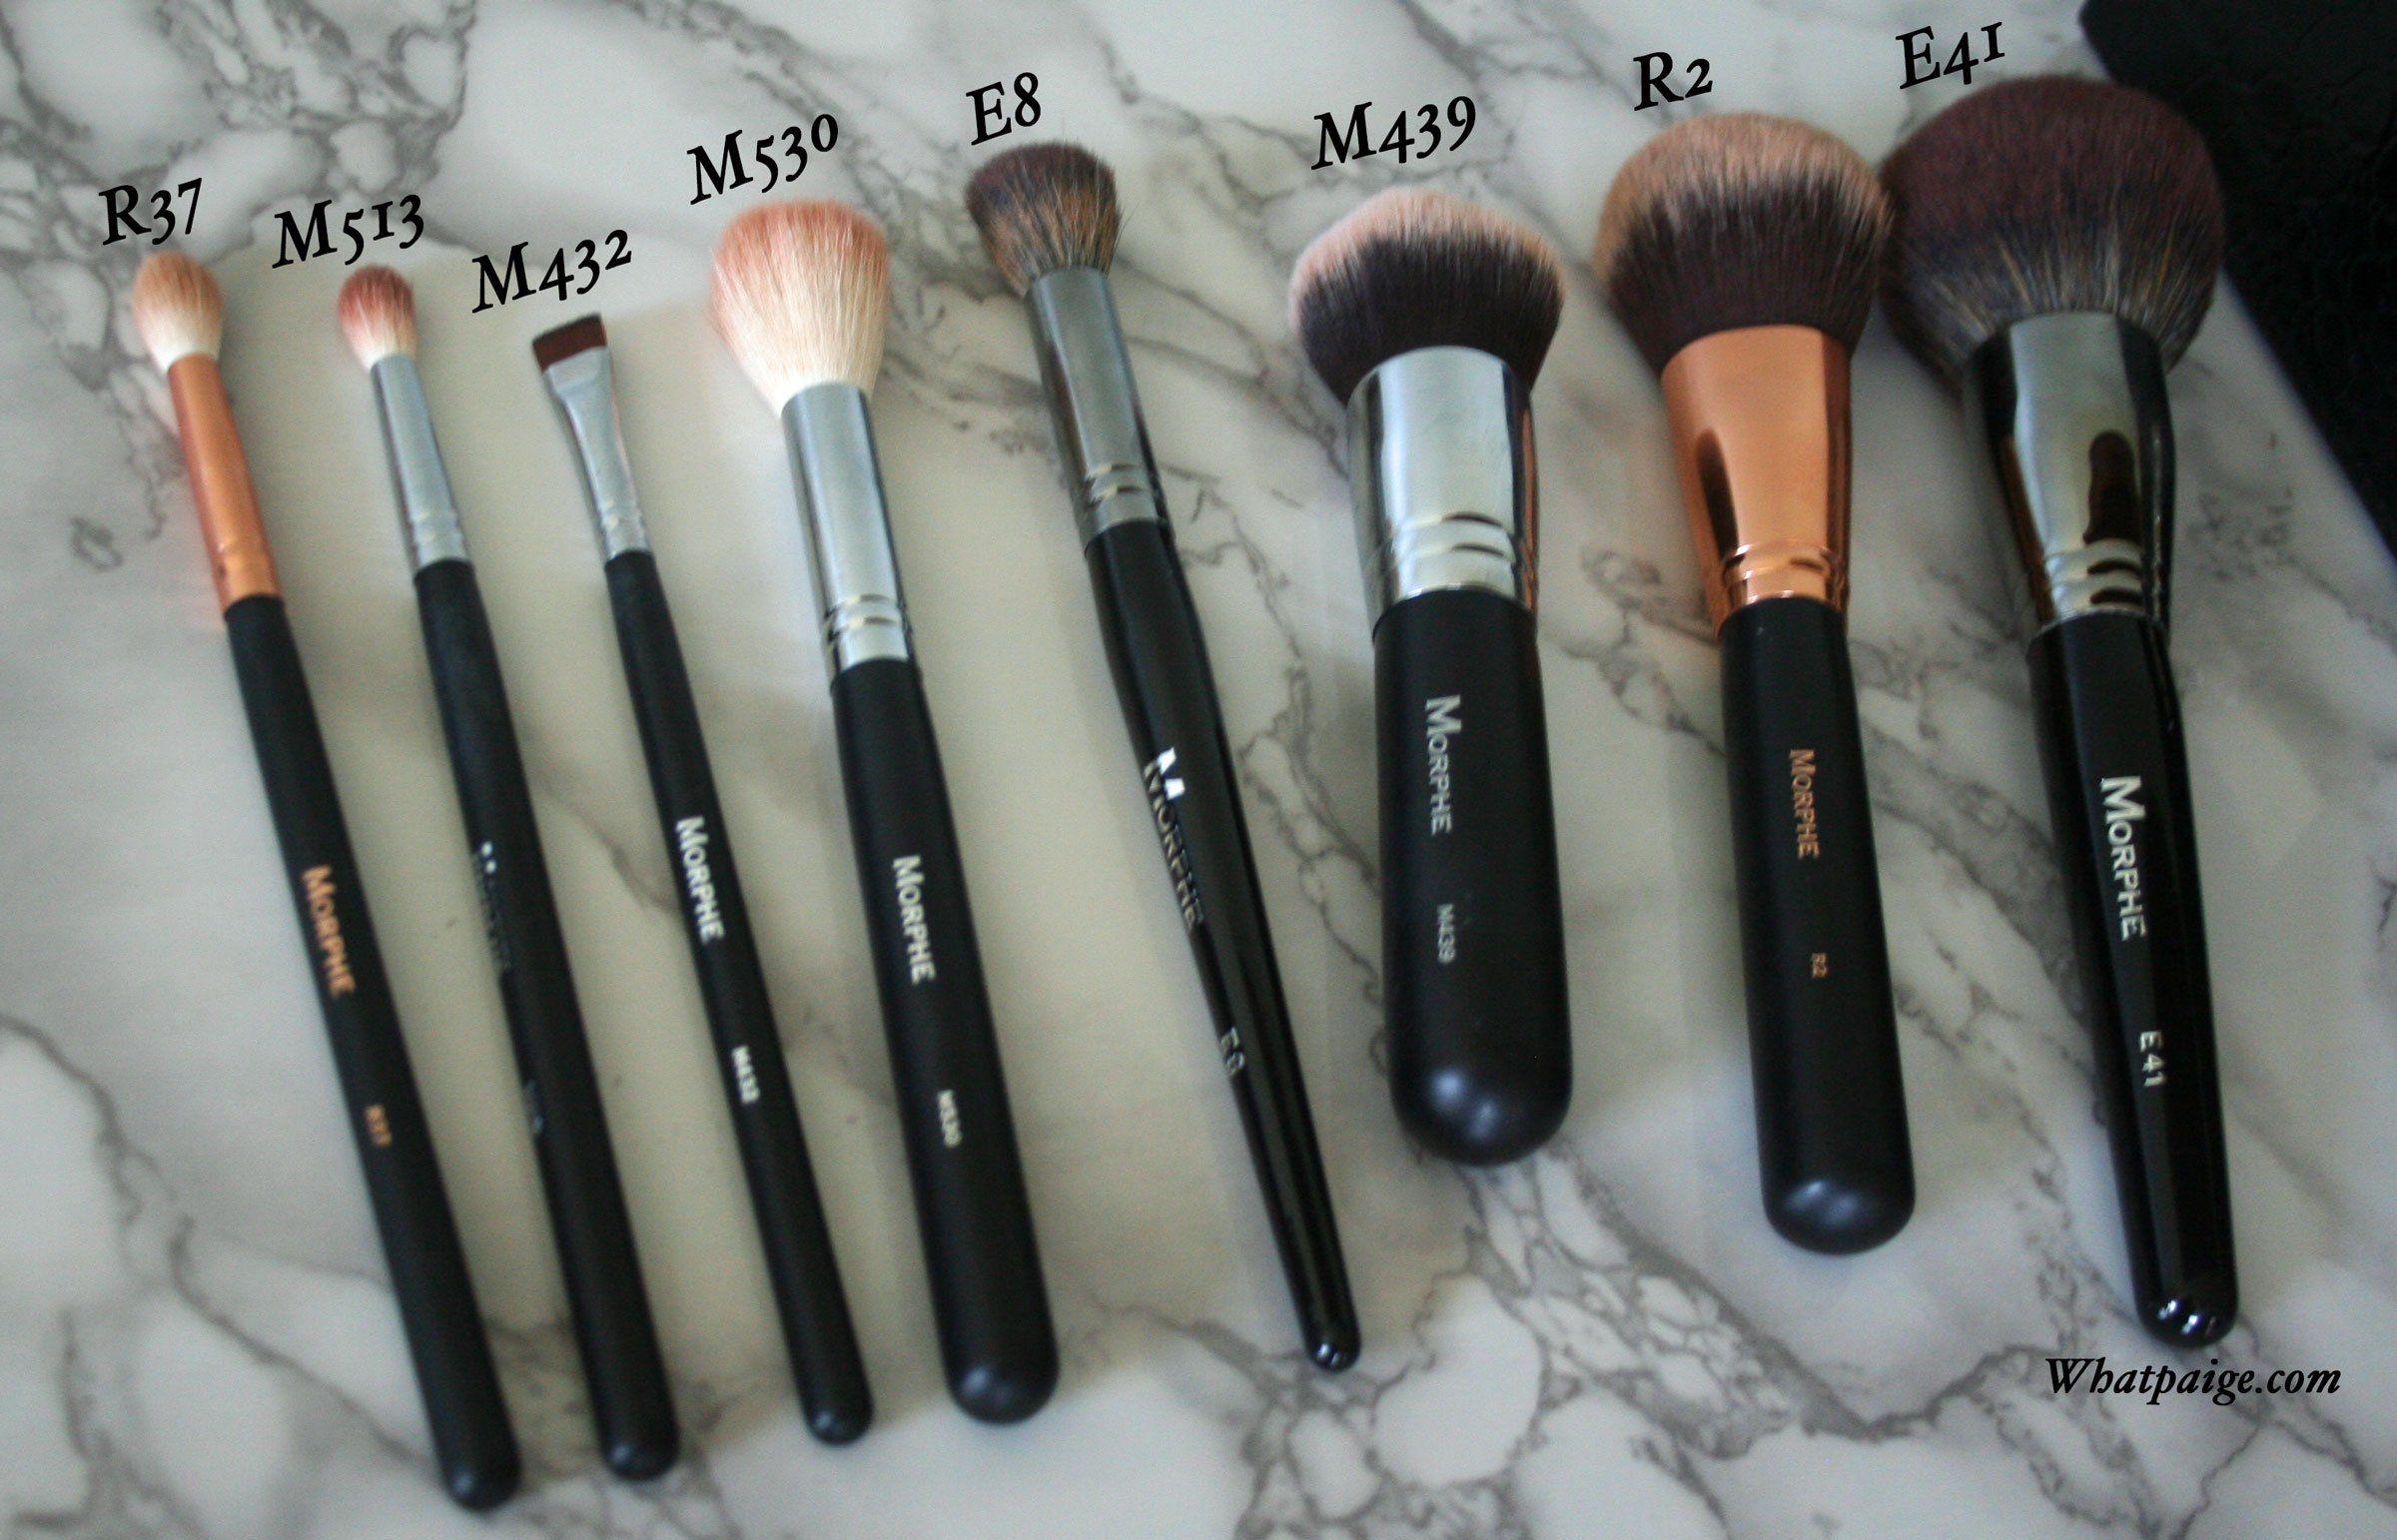 Morphe Makeup tools brushes, Brush, Jaclyn hill